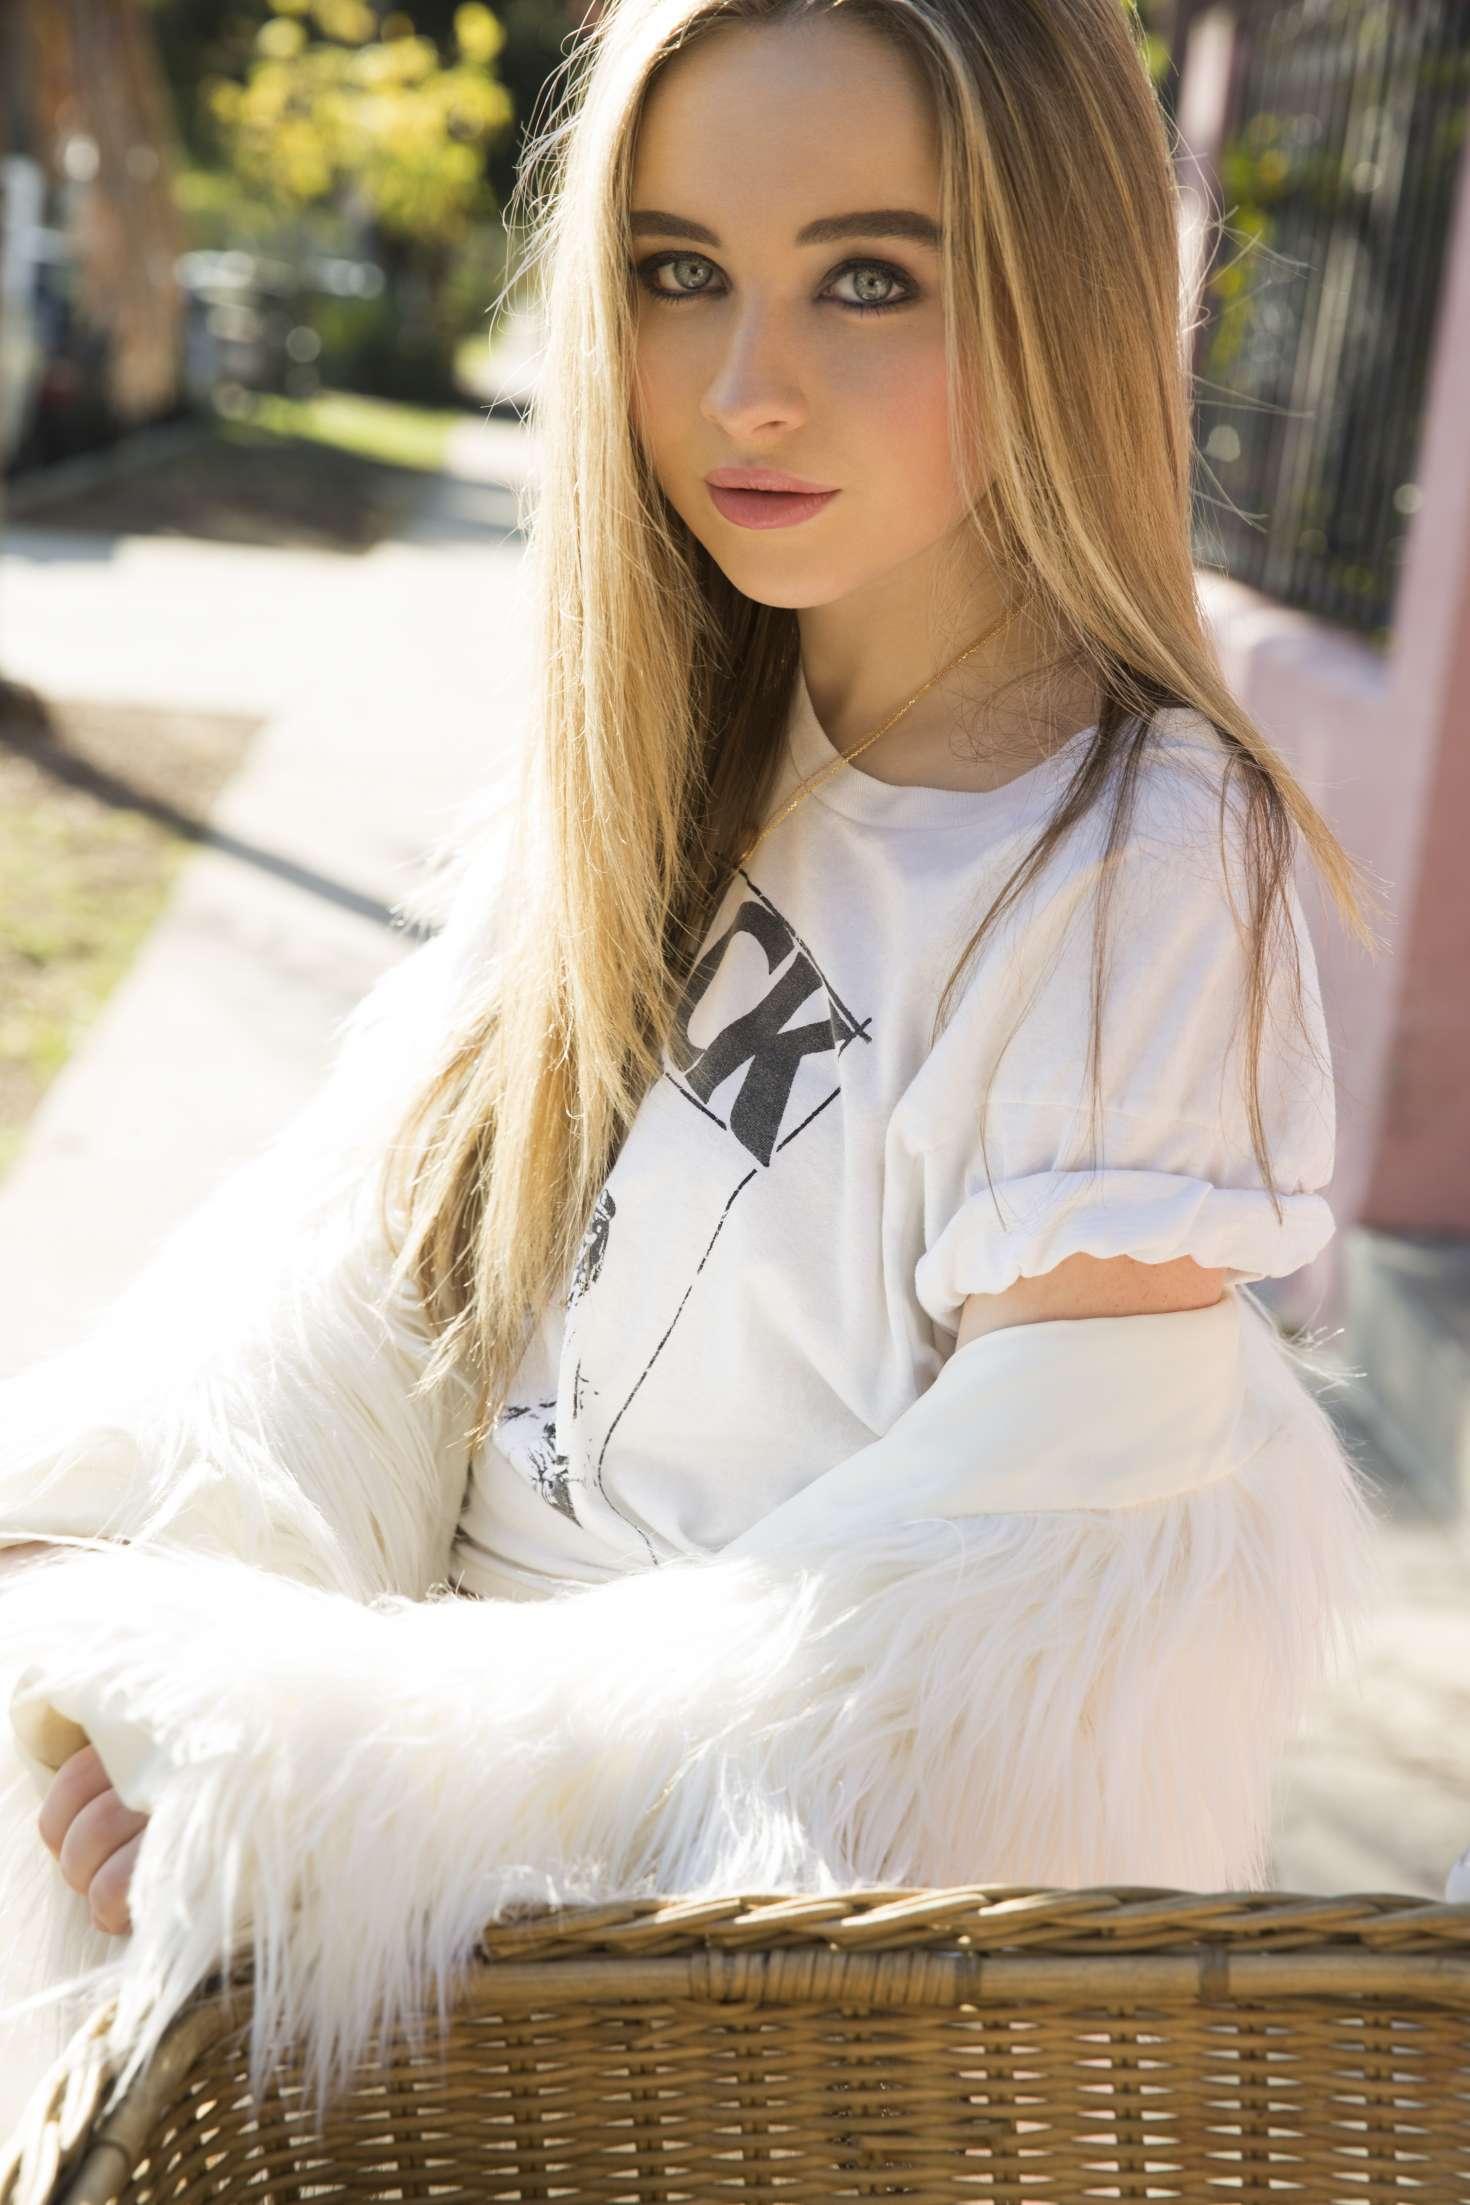 Sabrina Carpenter - WHY Photoshoot Behind the Scenes - YouTube